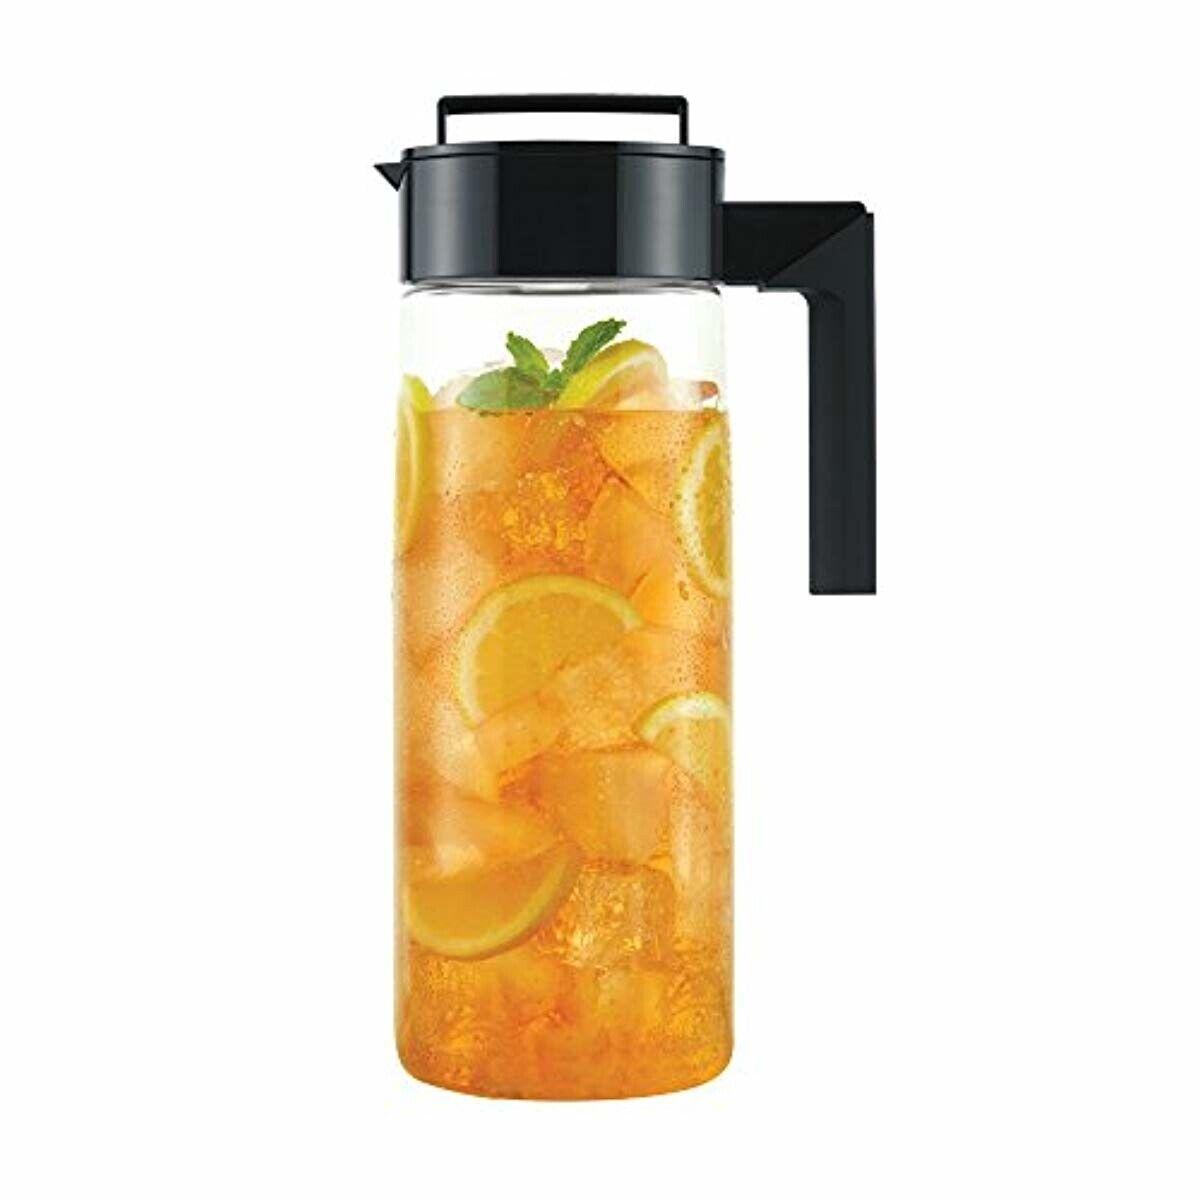 Takeya Airtight Pitcher Coffee Cold Brew Juice Leak Proof Li